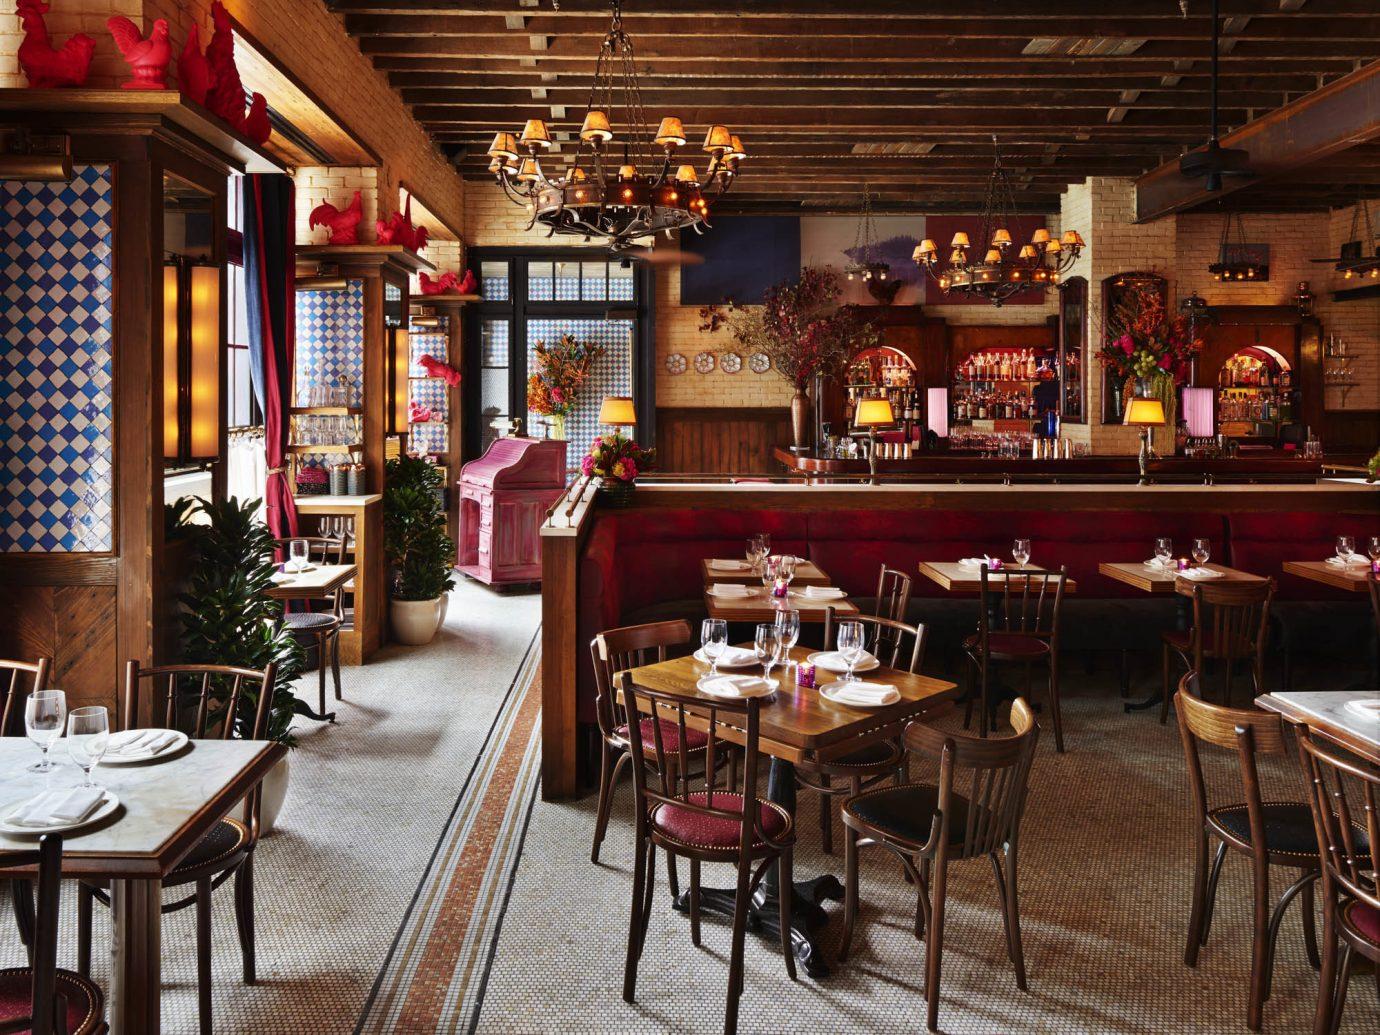 Food + Drink Romance indoor restaurant Bar tavern café meal